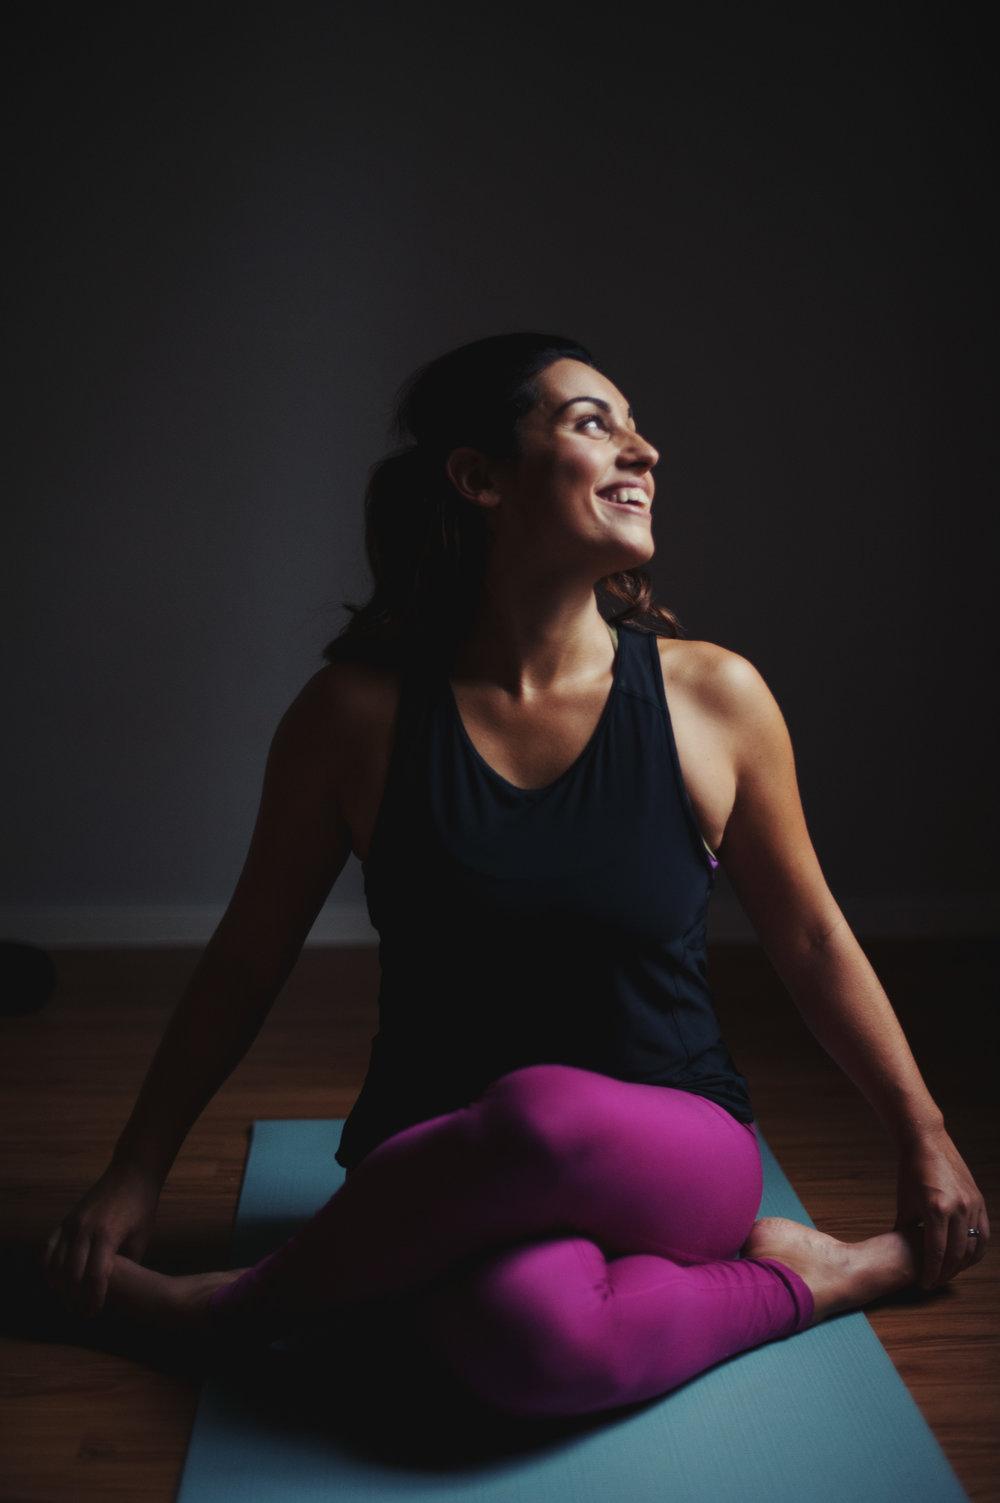 yoga-picture-the-vinyasa-people-katy-scherer-10.jpg